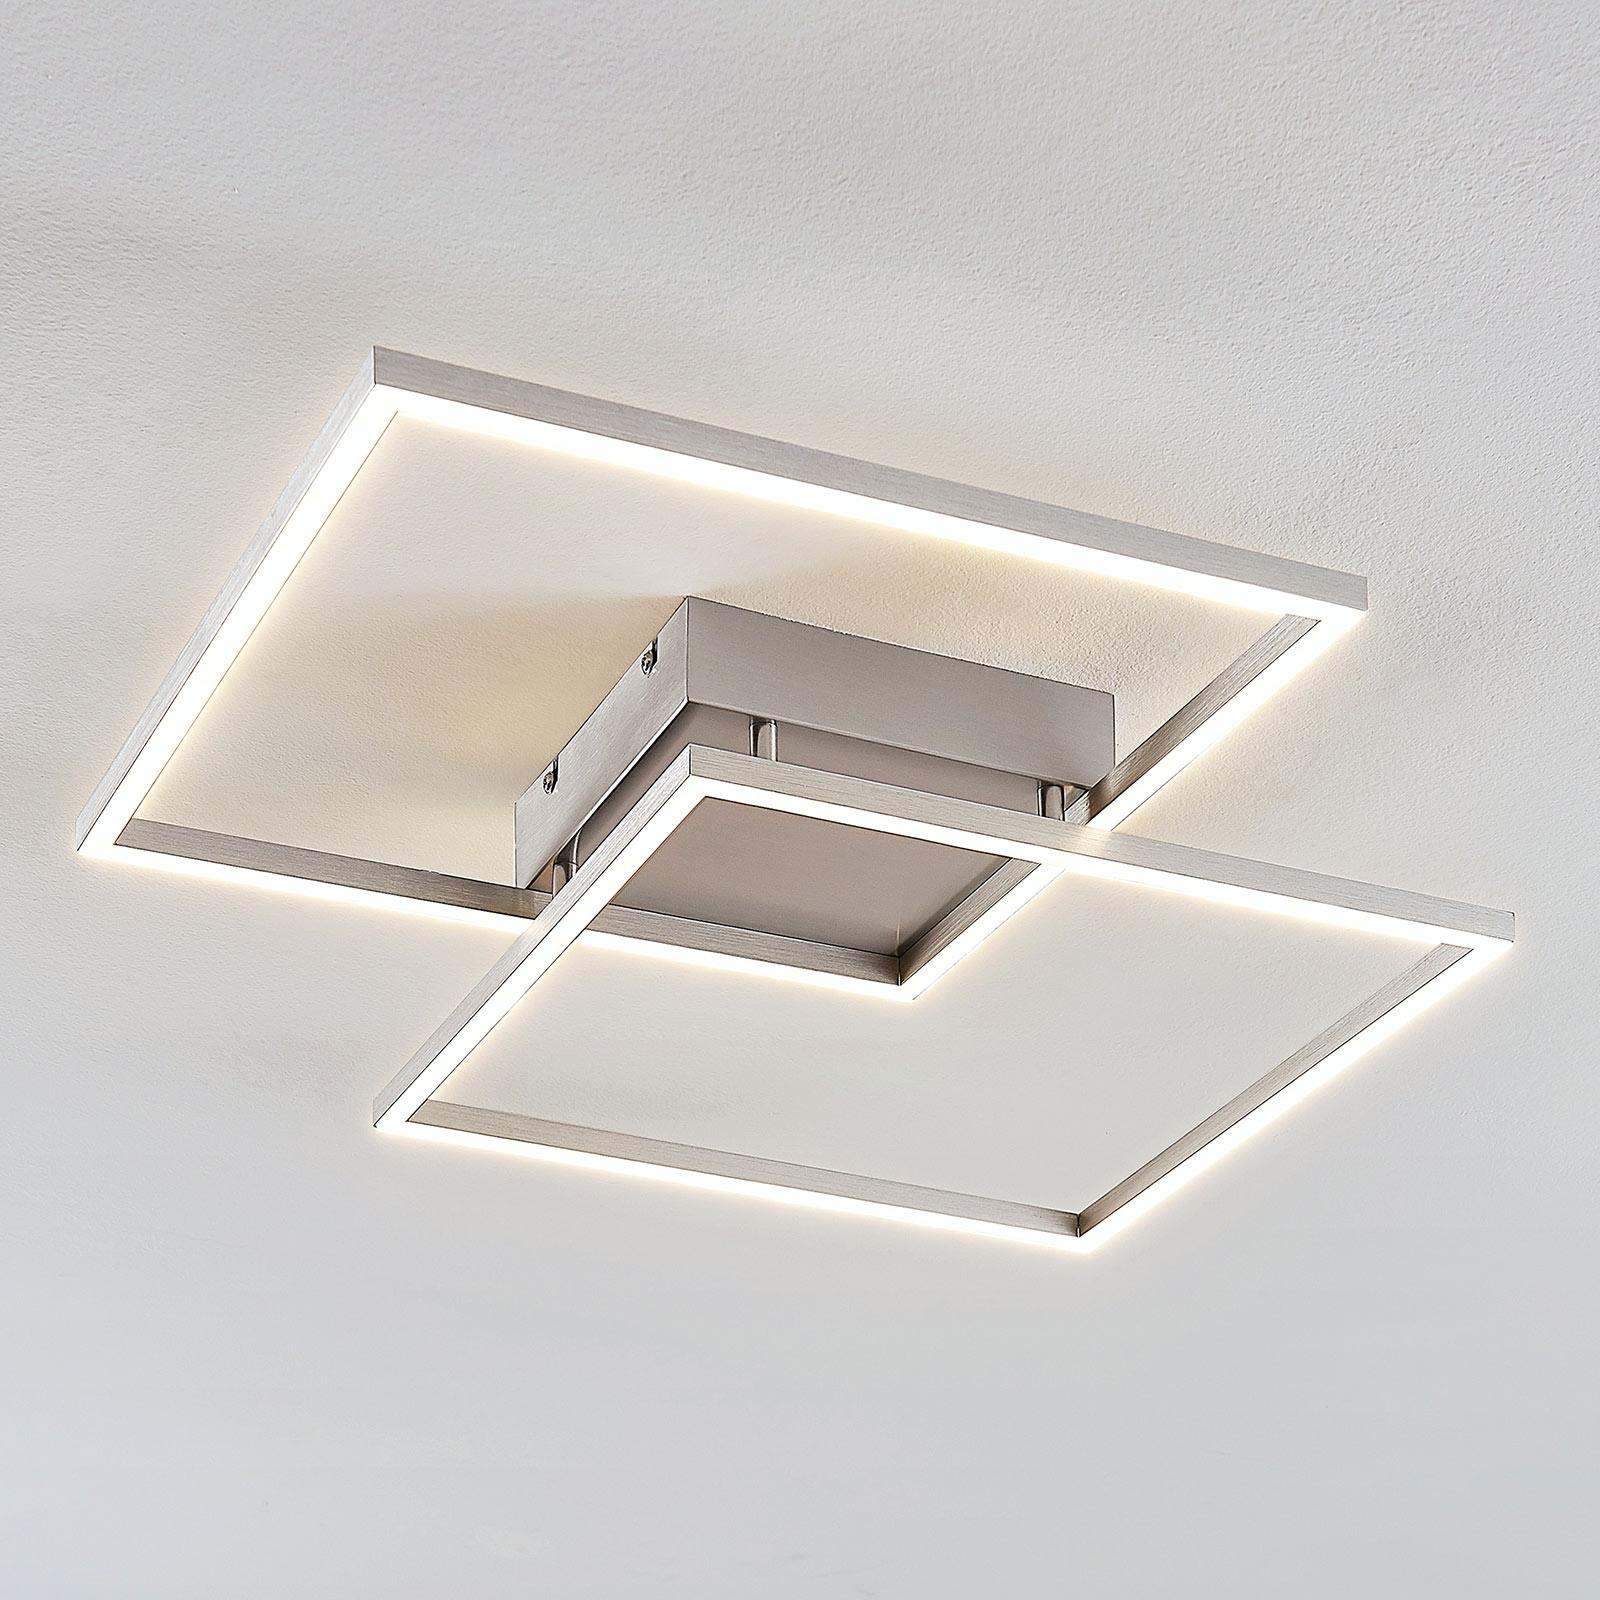 LED-Deckenlampe Mirac 52 cm